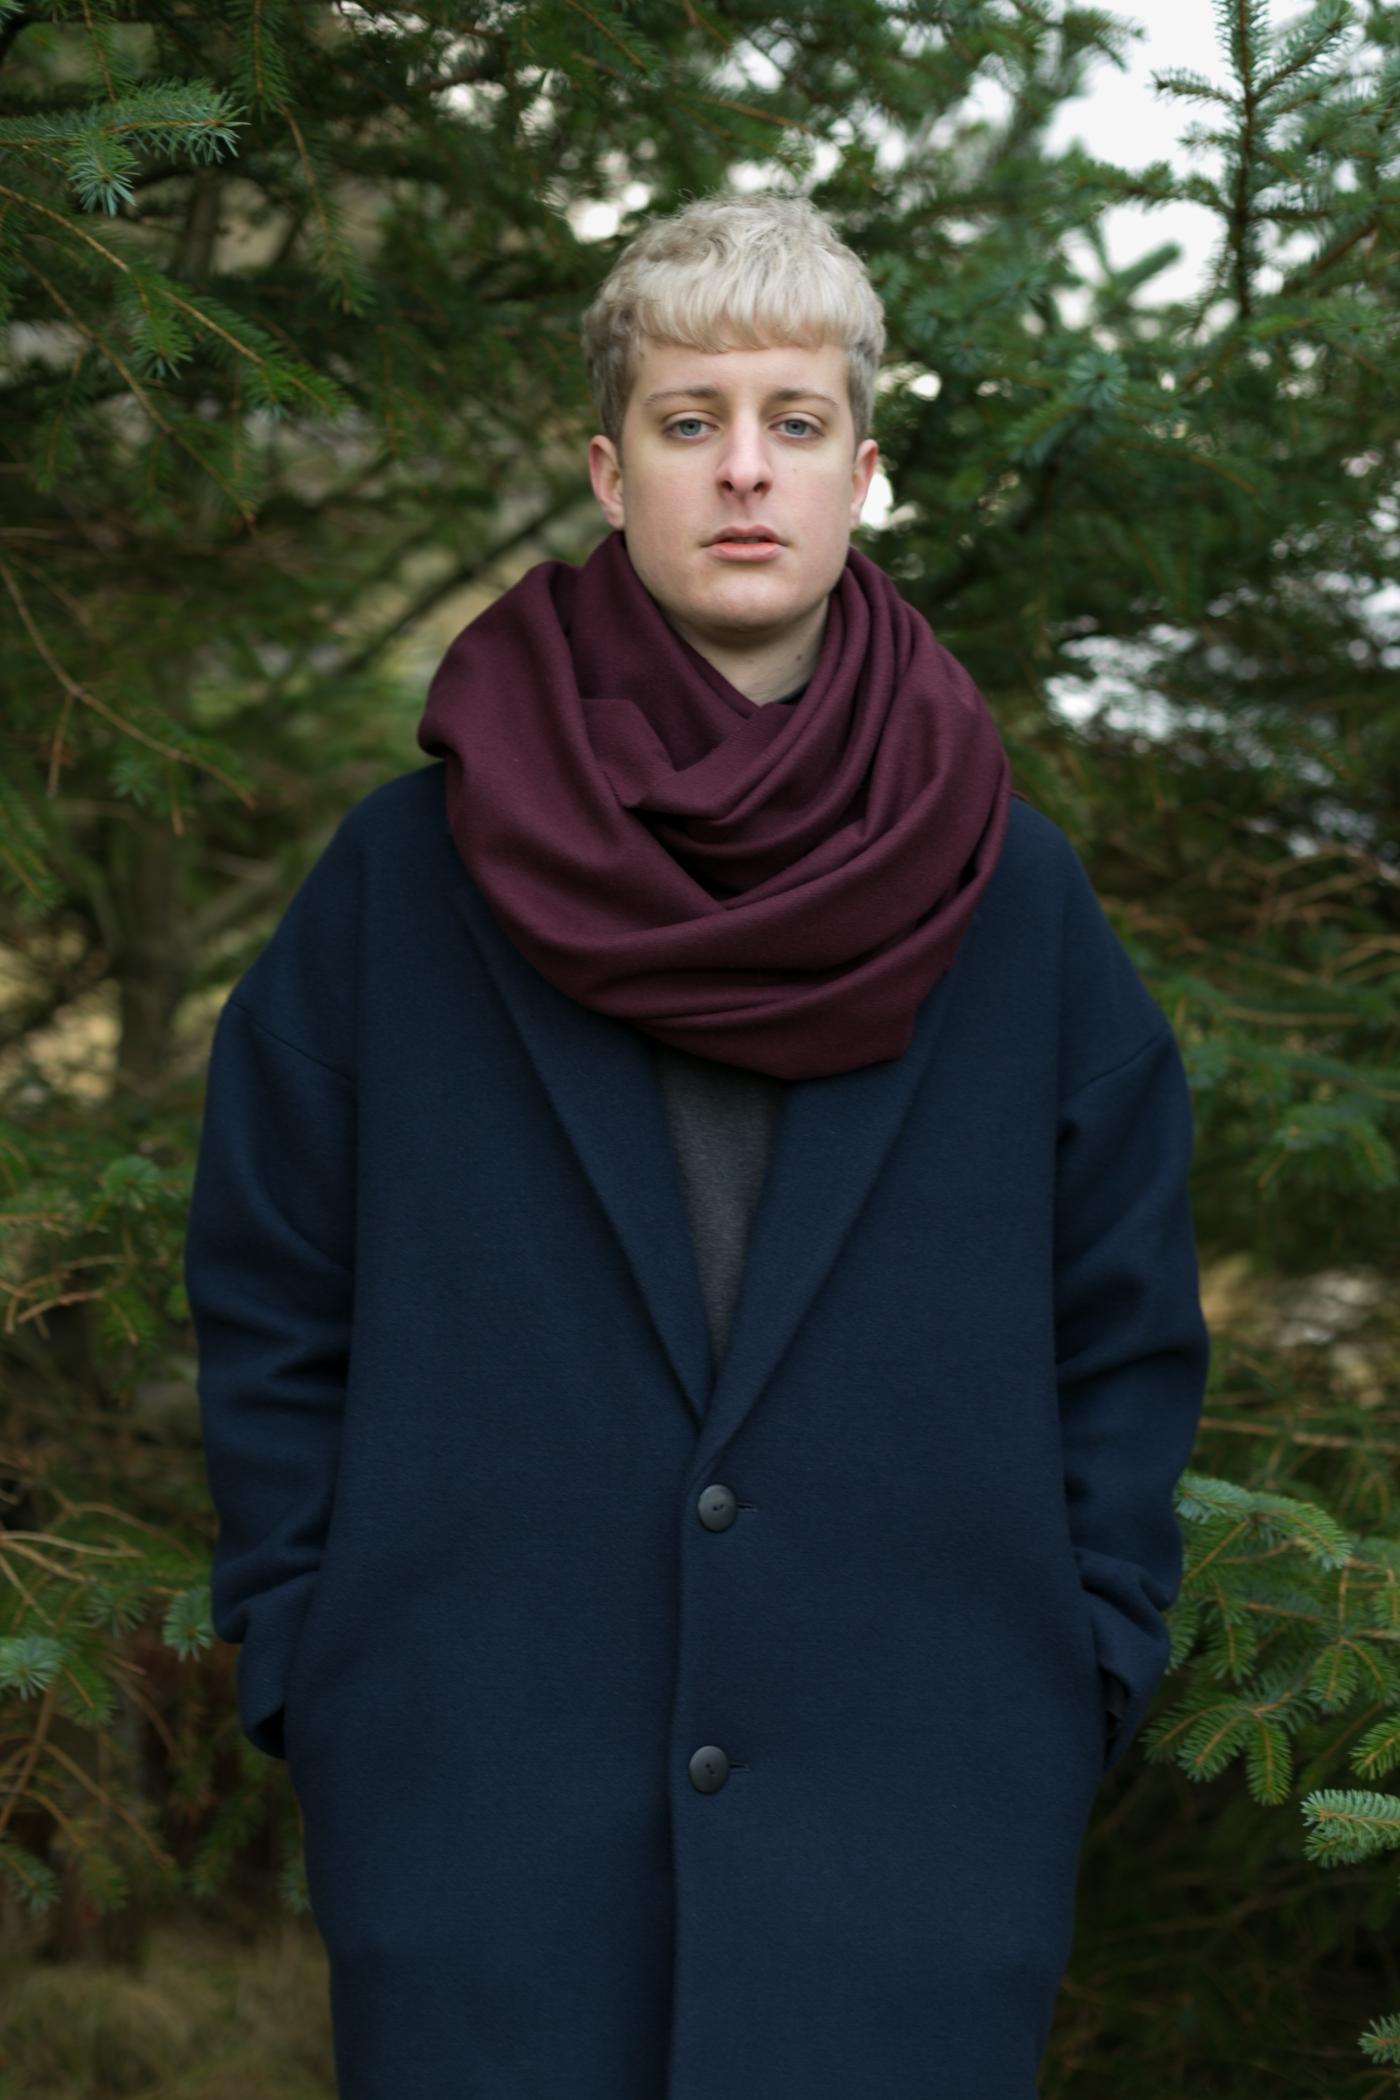 olav-jacket-and-copenhagen-scarf